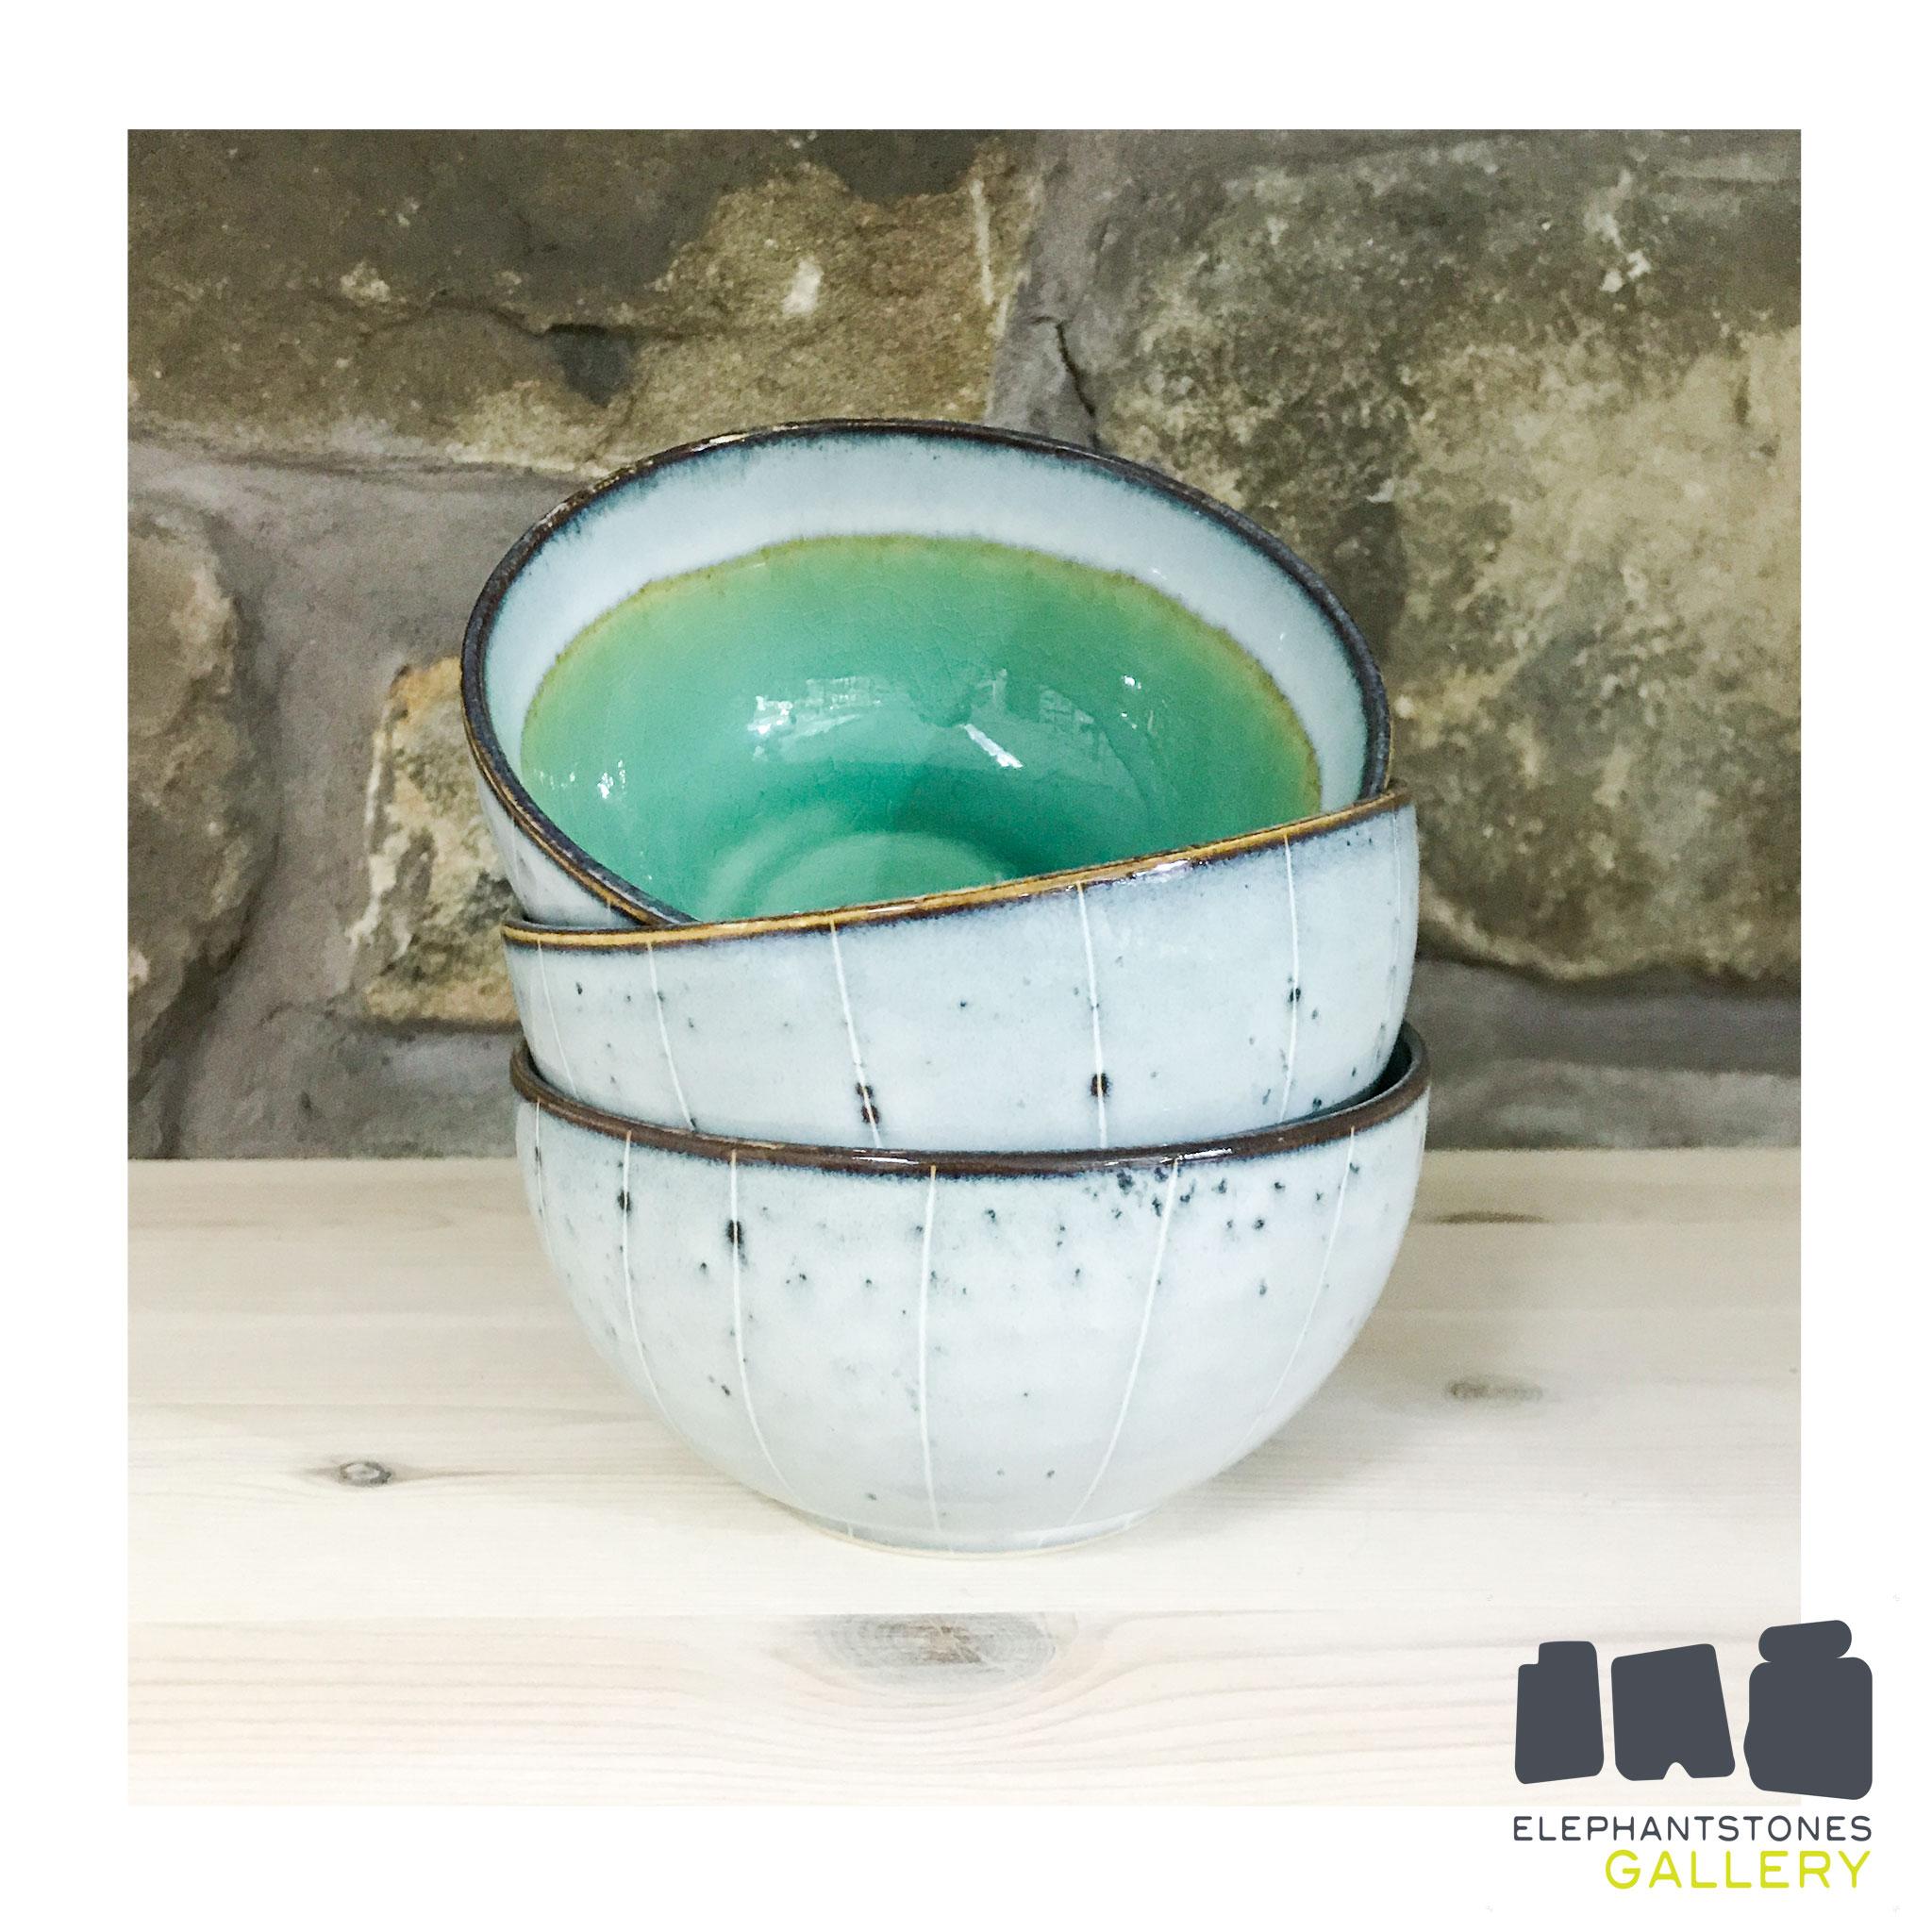 Elephantstones_bowls.jpg